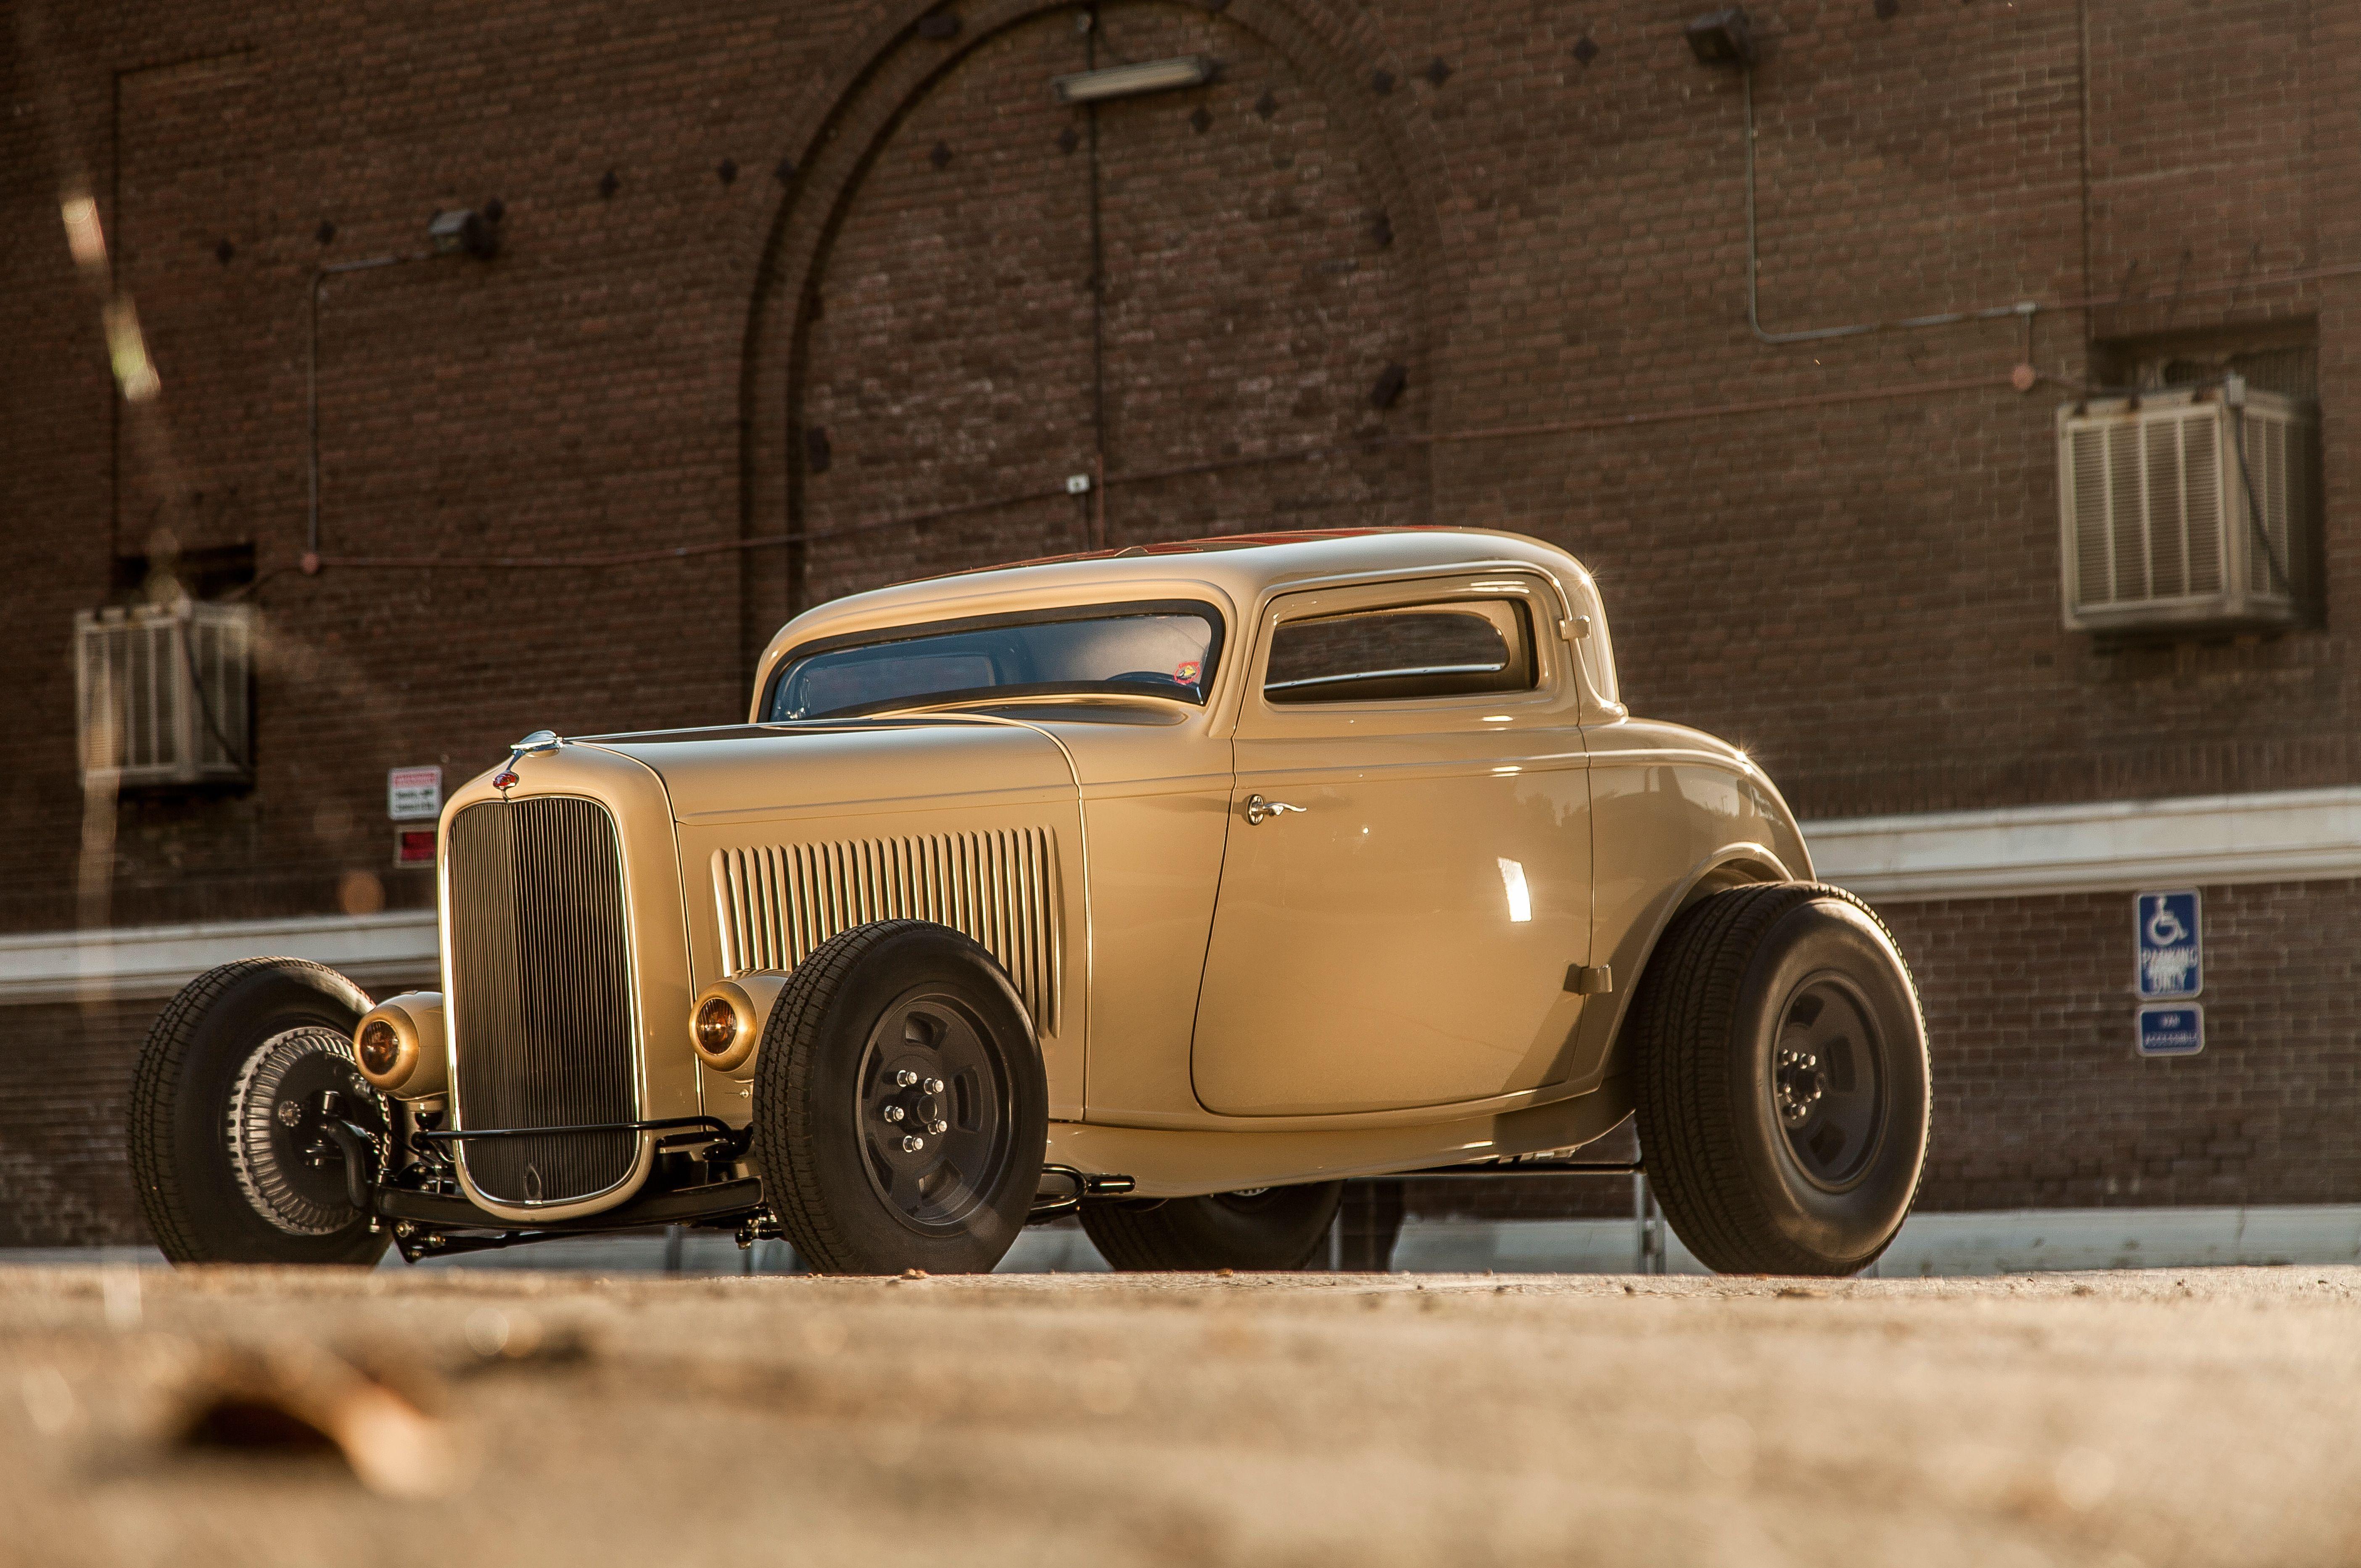 1932 Ford Deuce Coupe Three Window Hot Rod Hotrod Chopped Top USA ...